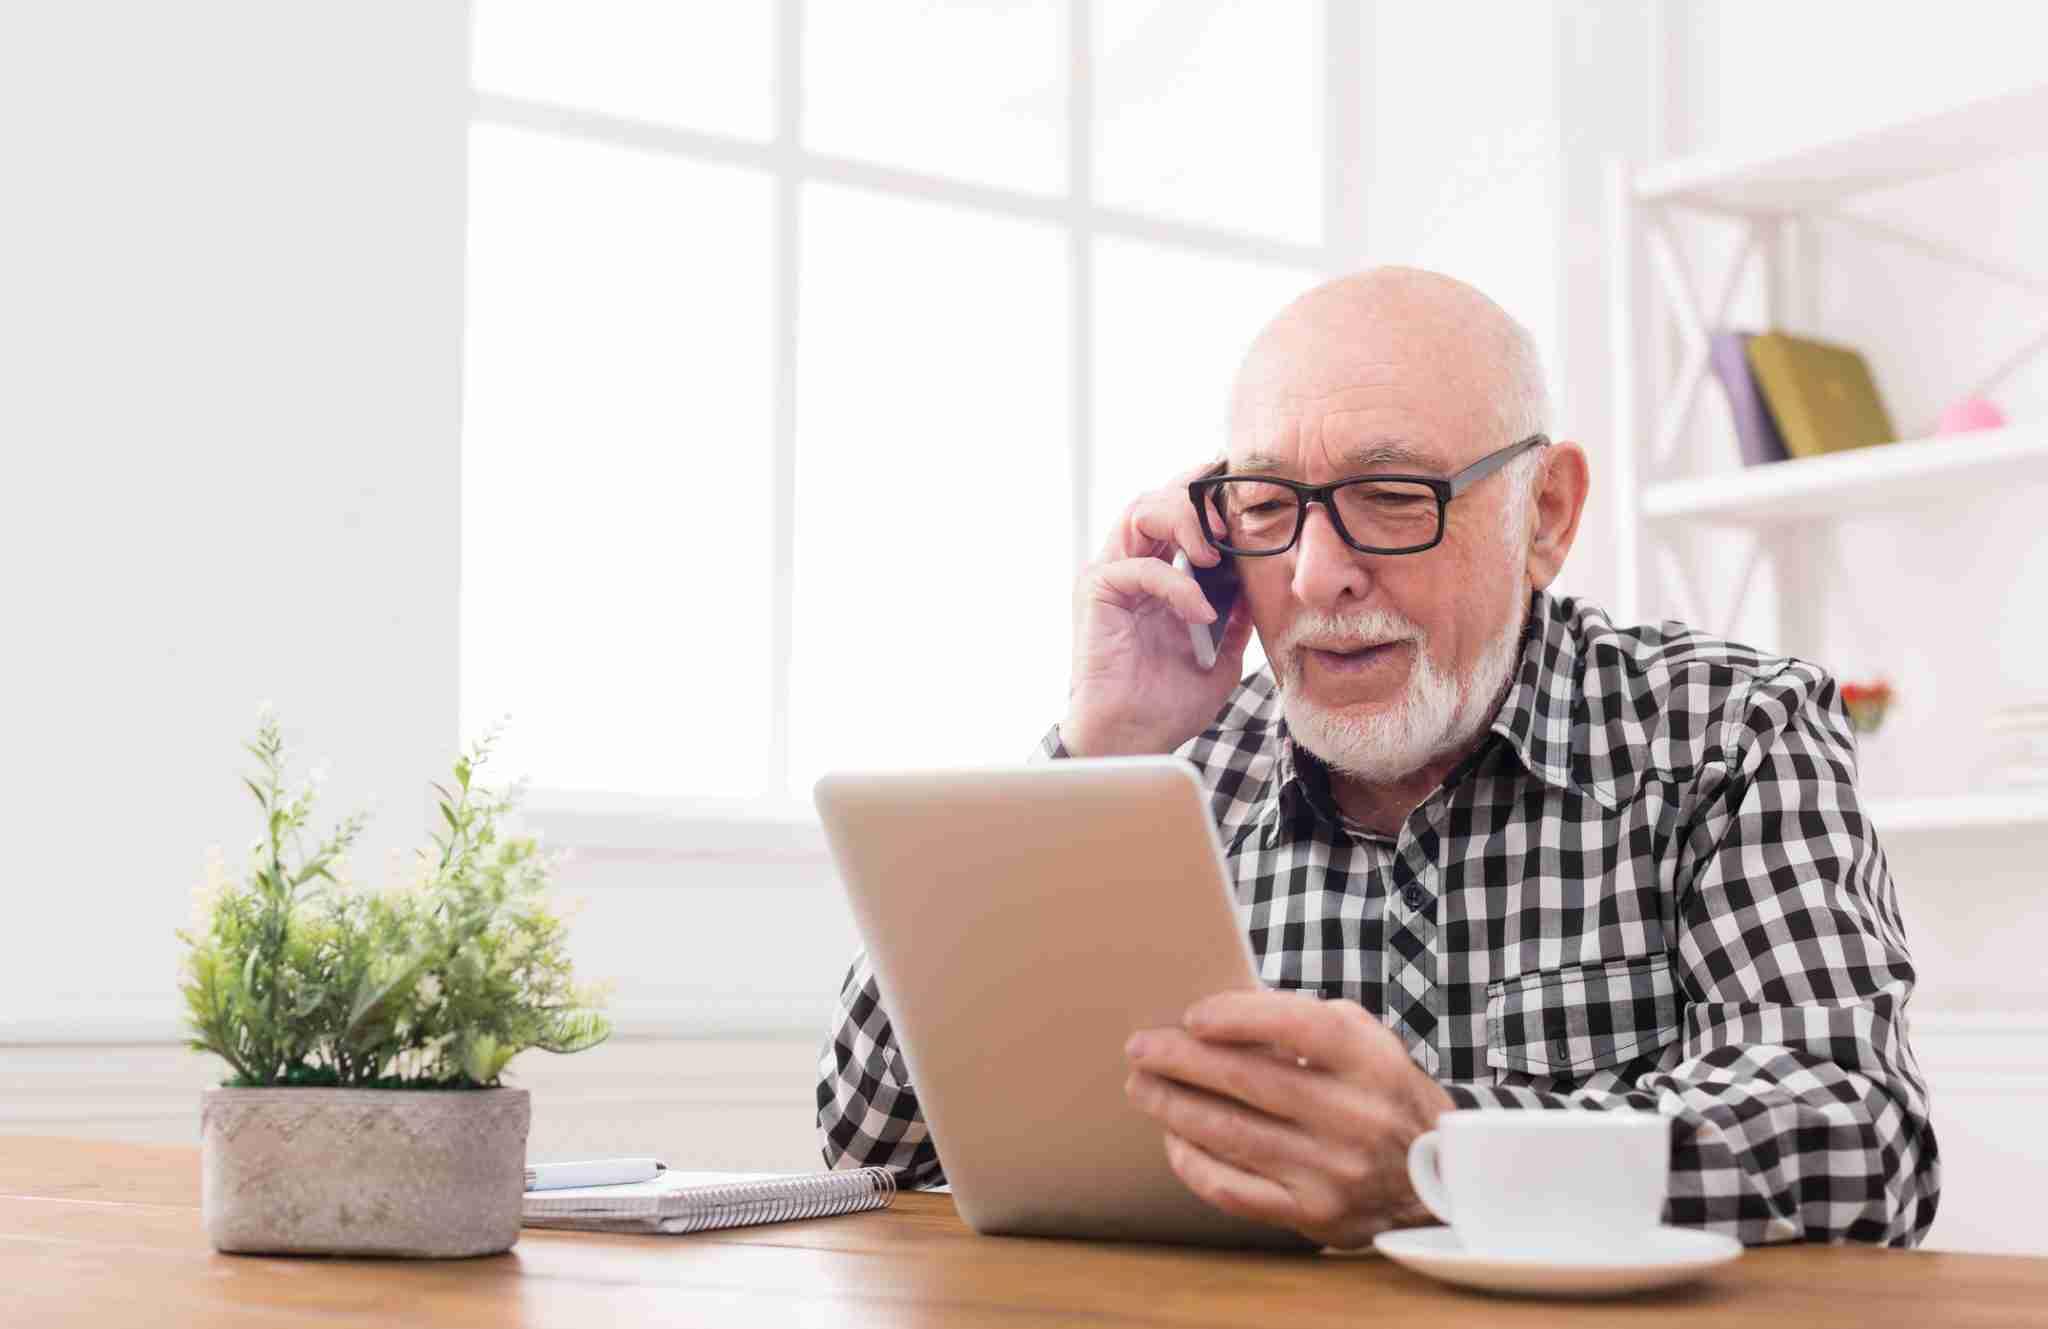 Man with white beard talking on phone